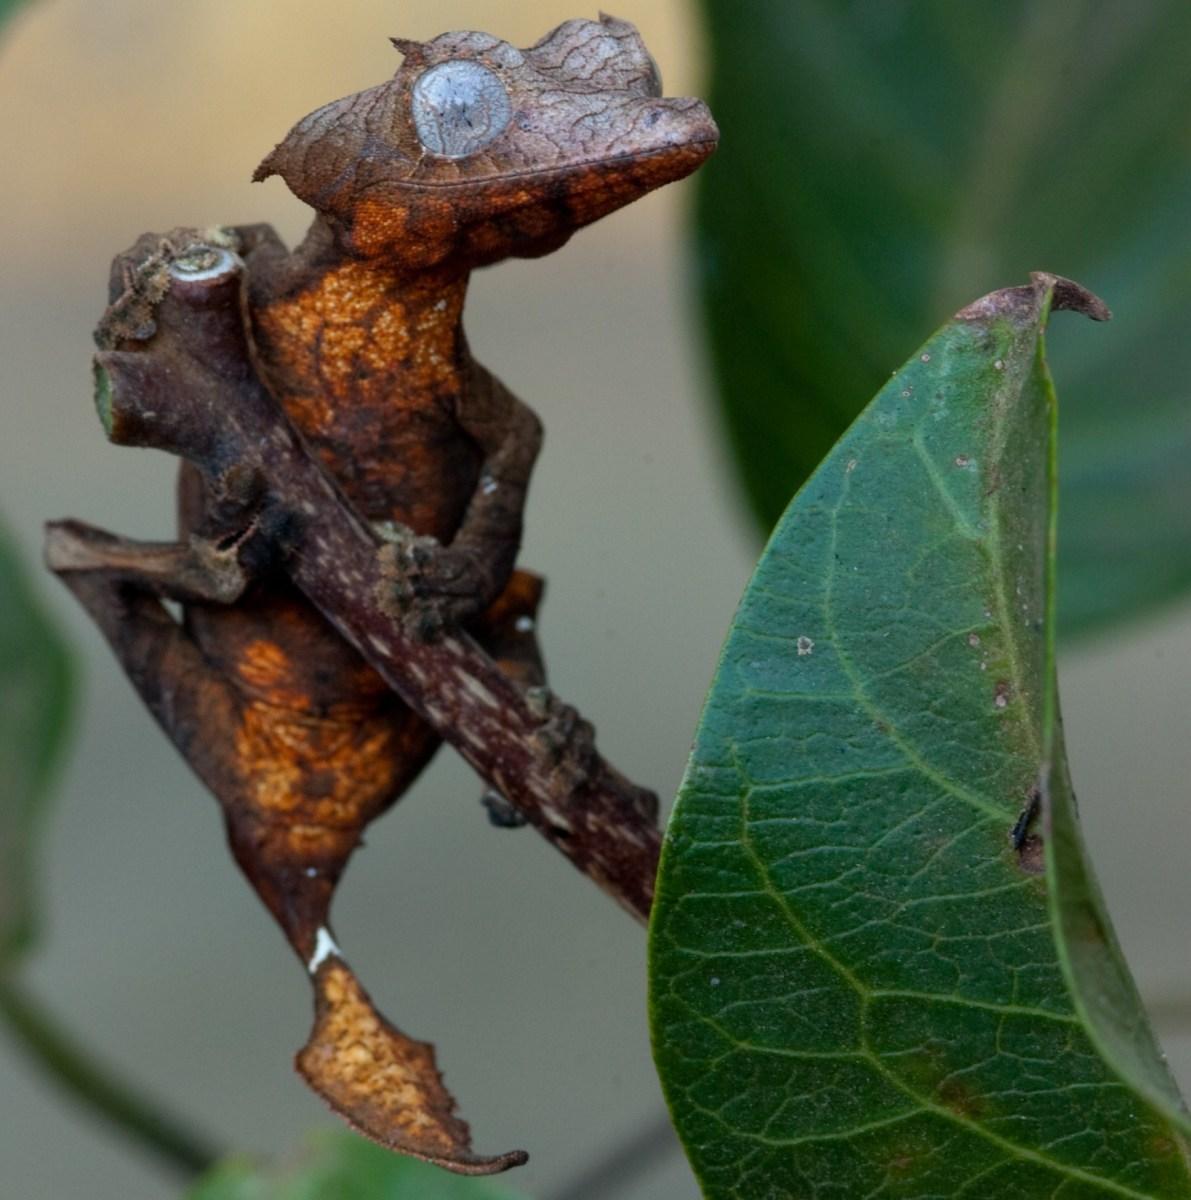 Lizards: Leaf Tailed Gecko